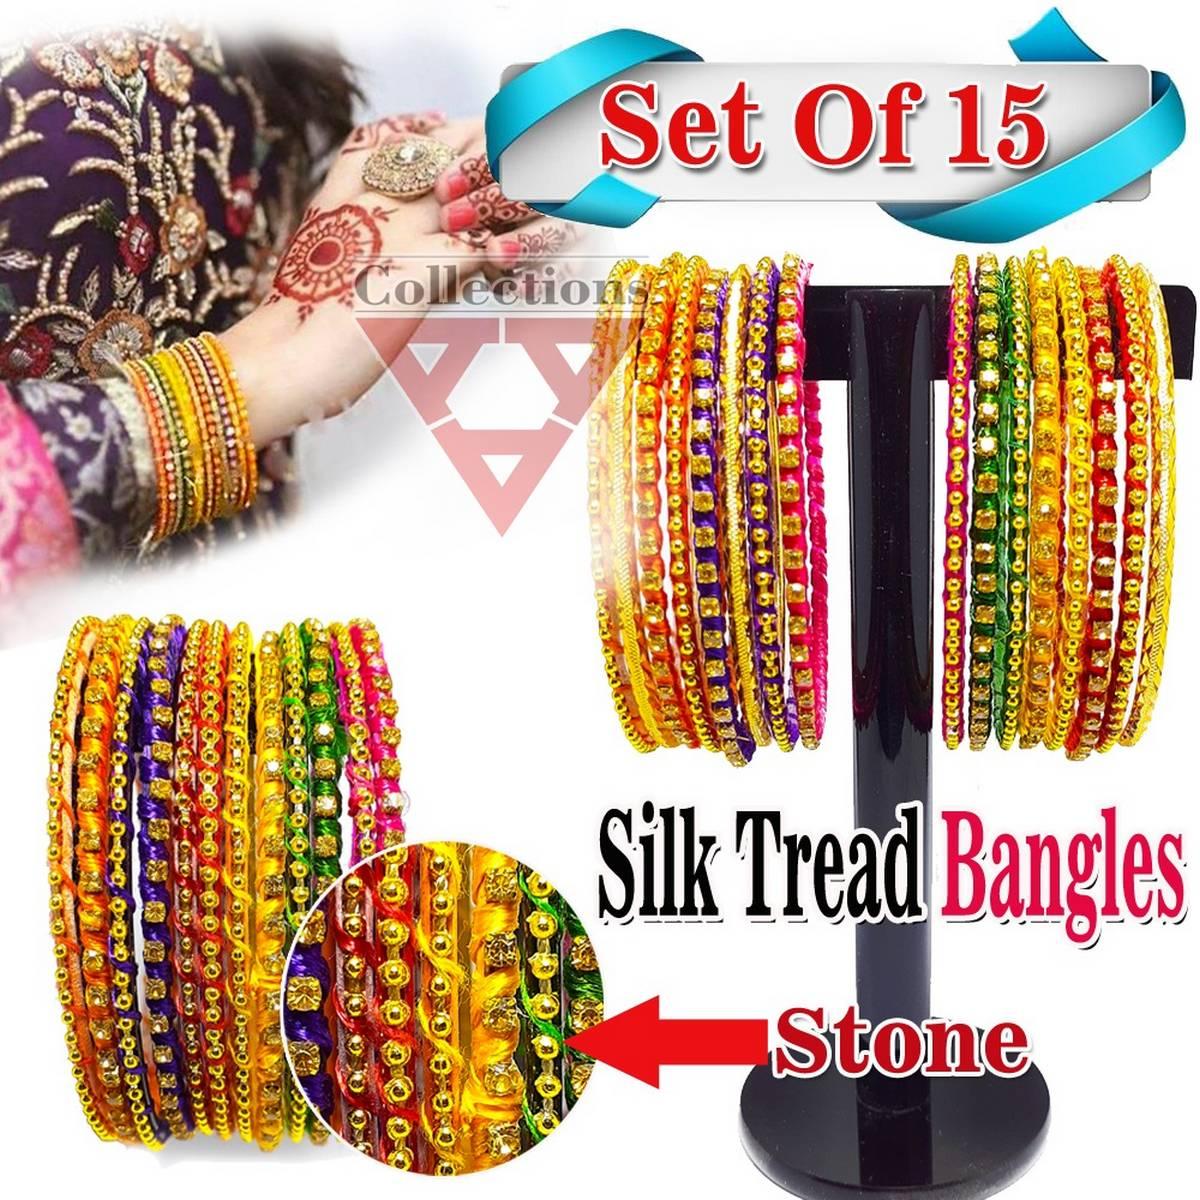 Stylish Handmade Silk Thread Bangles With Beaded For Girls (15 Bangles)